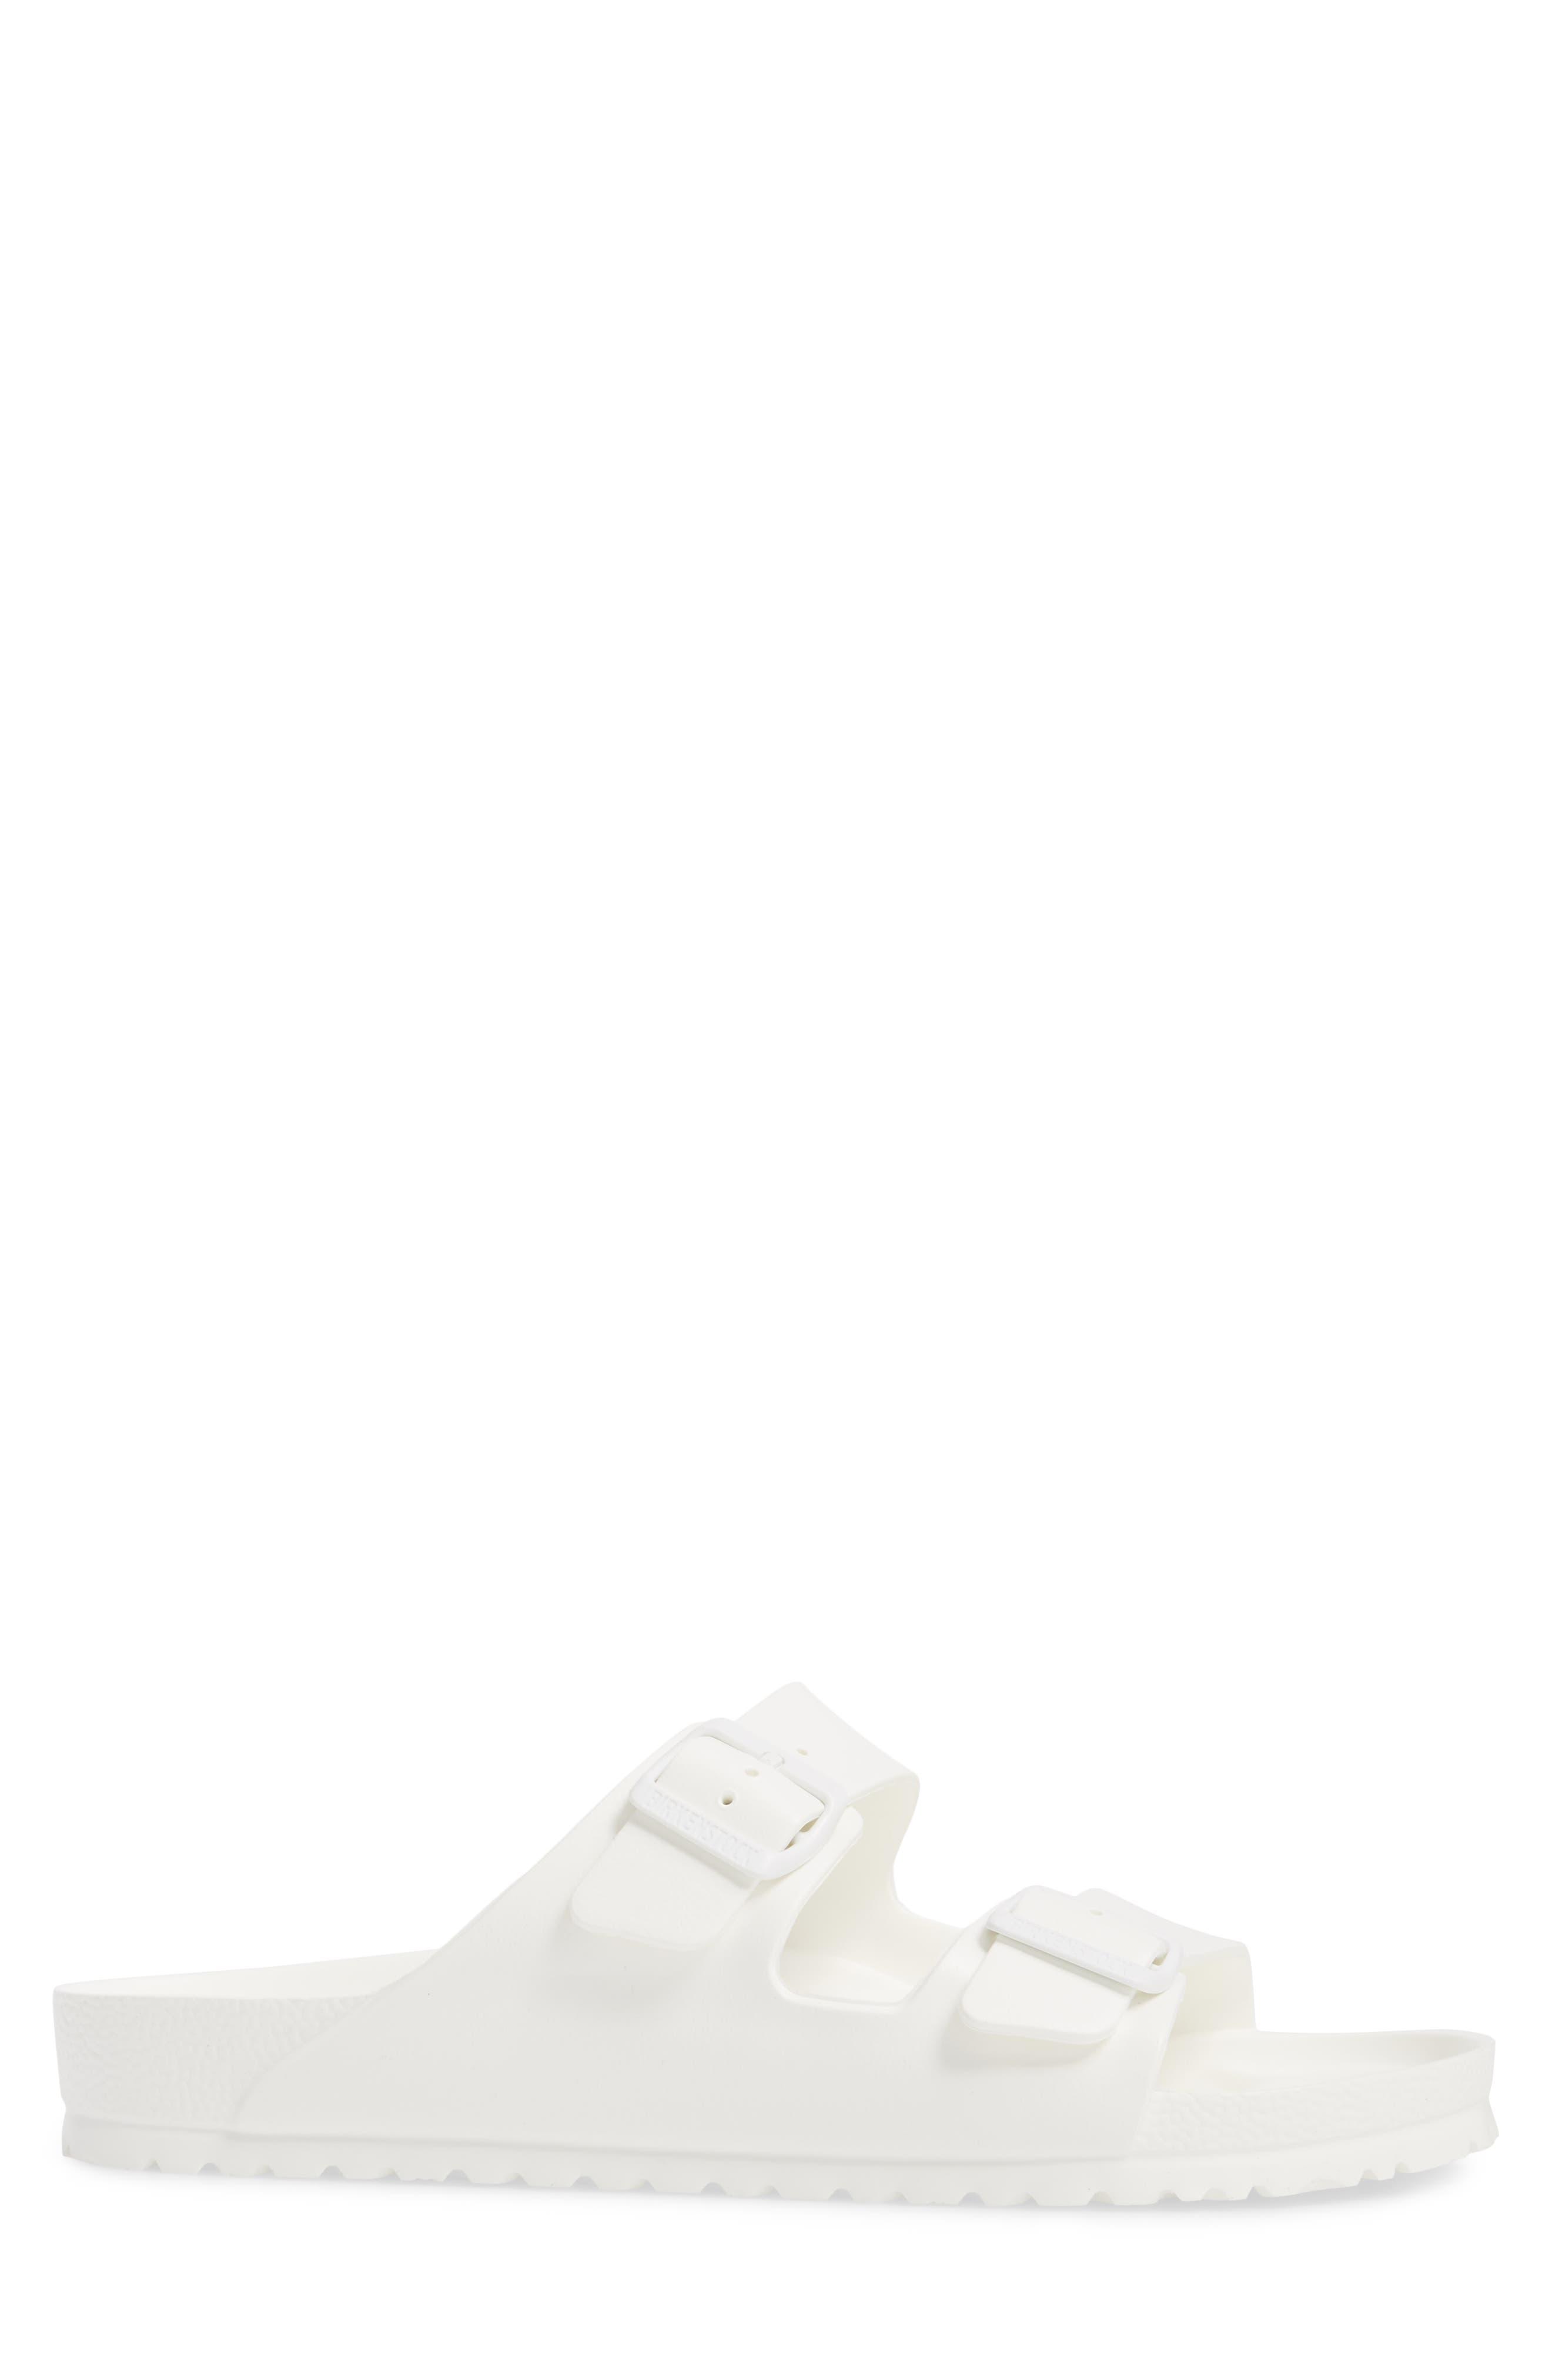 'Essentials - Arizona EVA' Waterproof Slide Sandal,                             Alternate thumbnail 3, color,                             WHITE